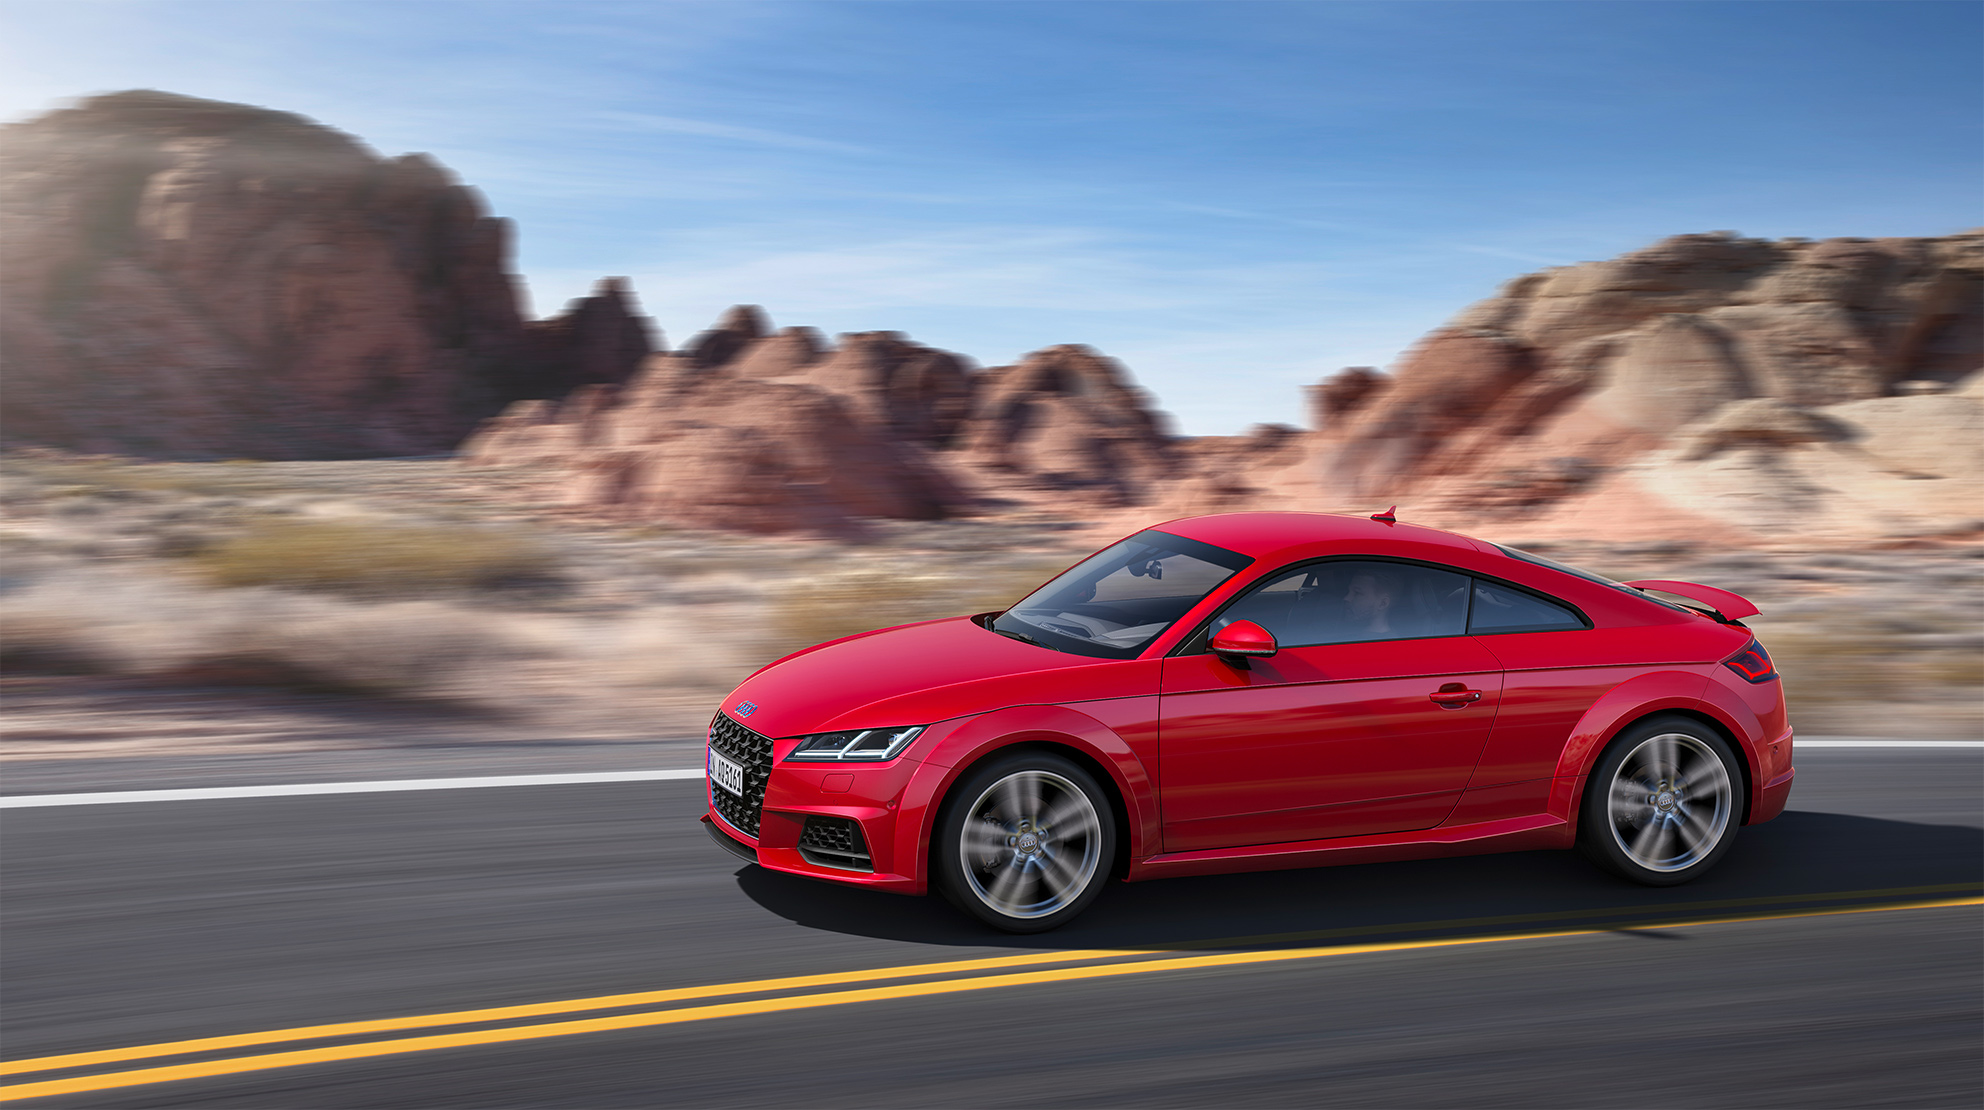 TrackWorthy - 2019 Audi TT Coupe (2)